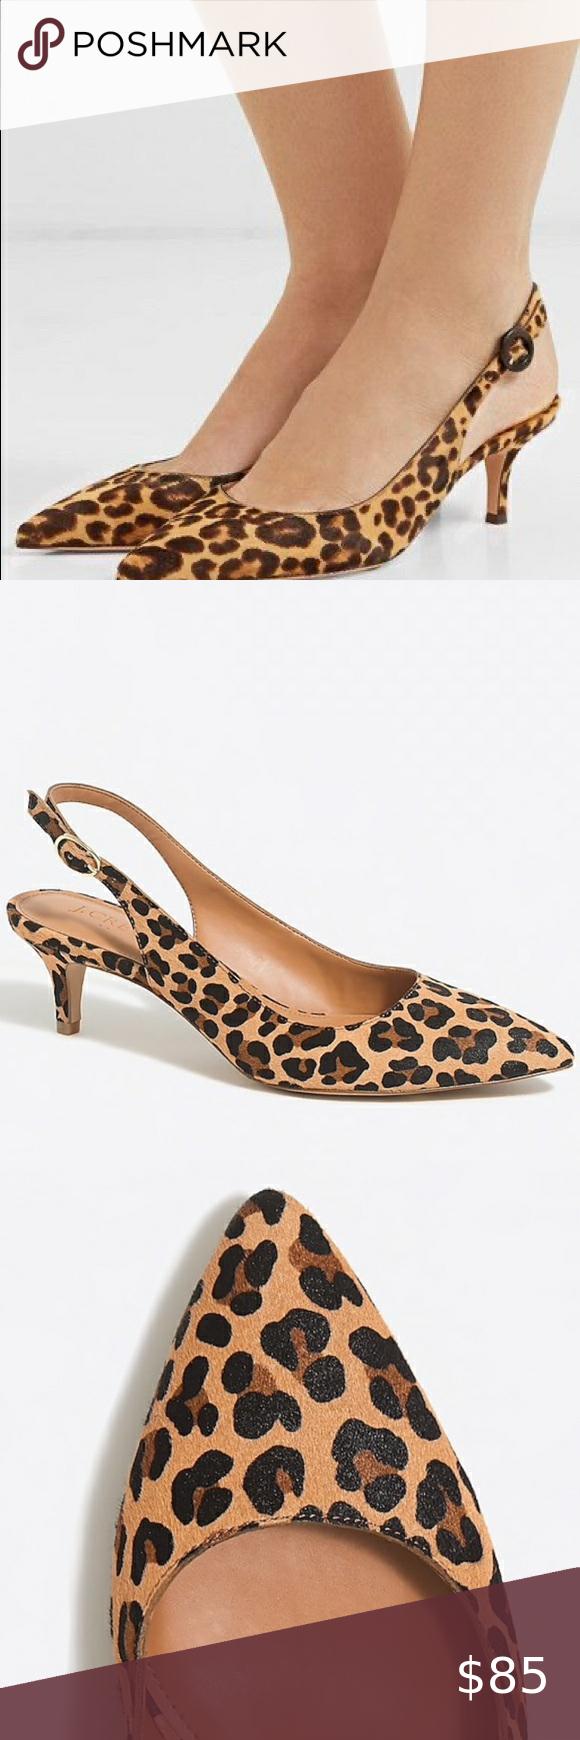 J Crew Esme Calf Hair Leopard Kitten Heels In 2020 Shoes Women Heels Heels Kitten Heels